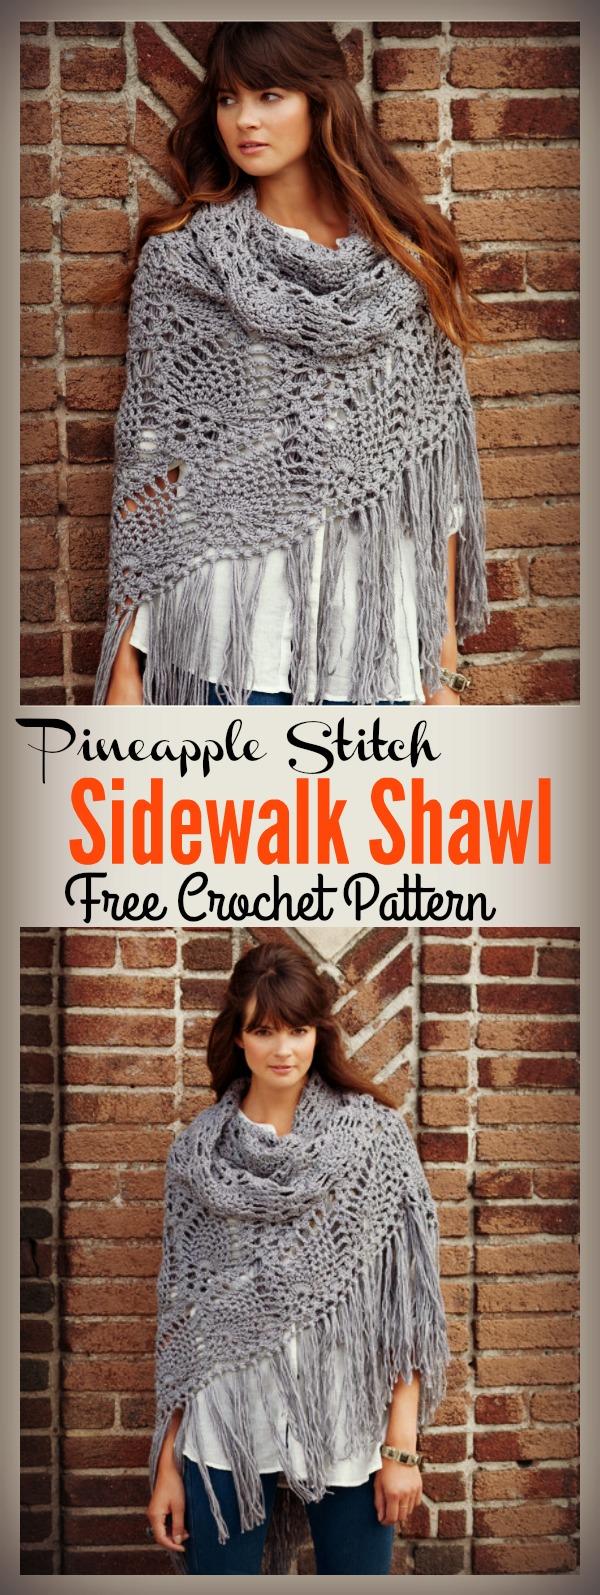 Pineapple Stitch Sidewalk Shawl Free Crochet Pattern and Video Tutorial